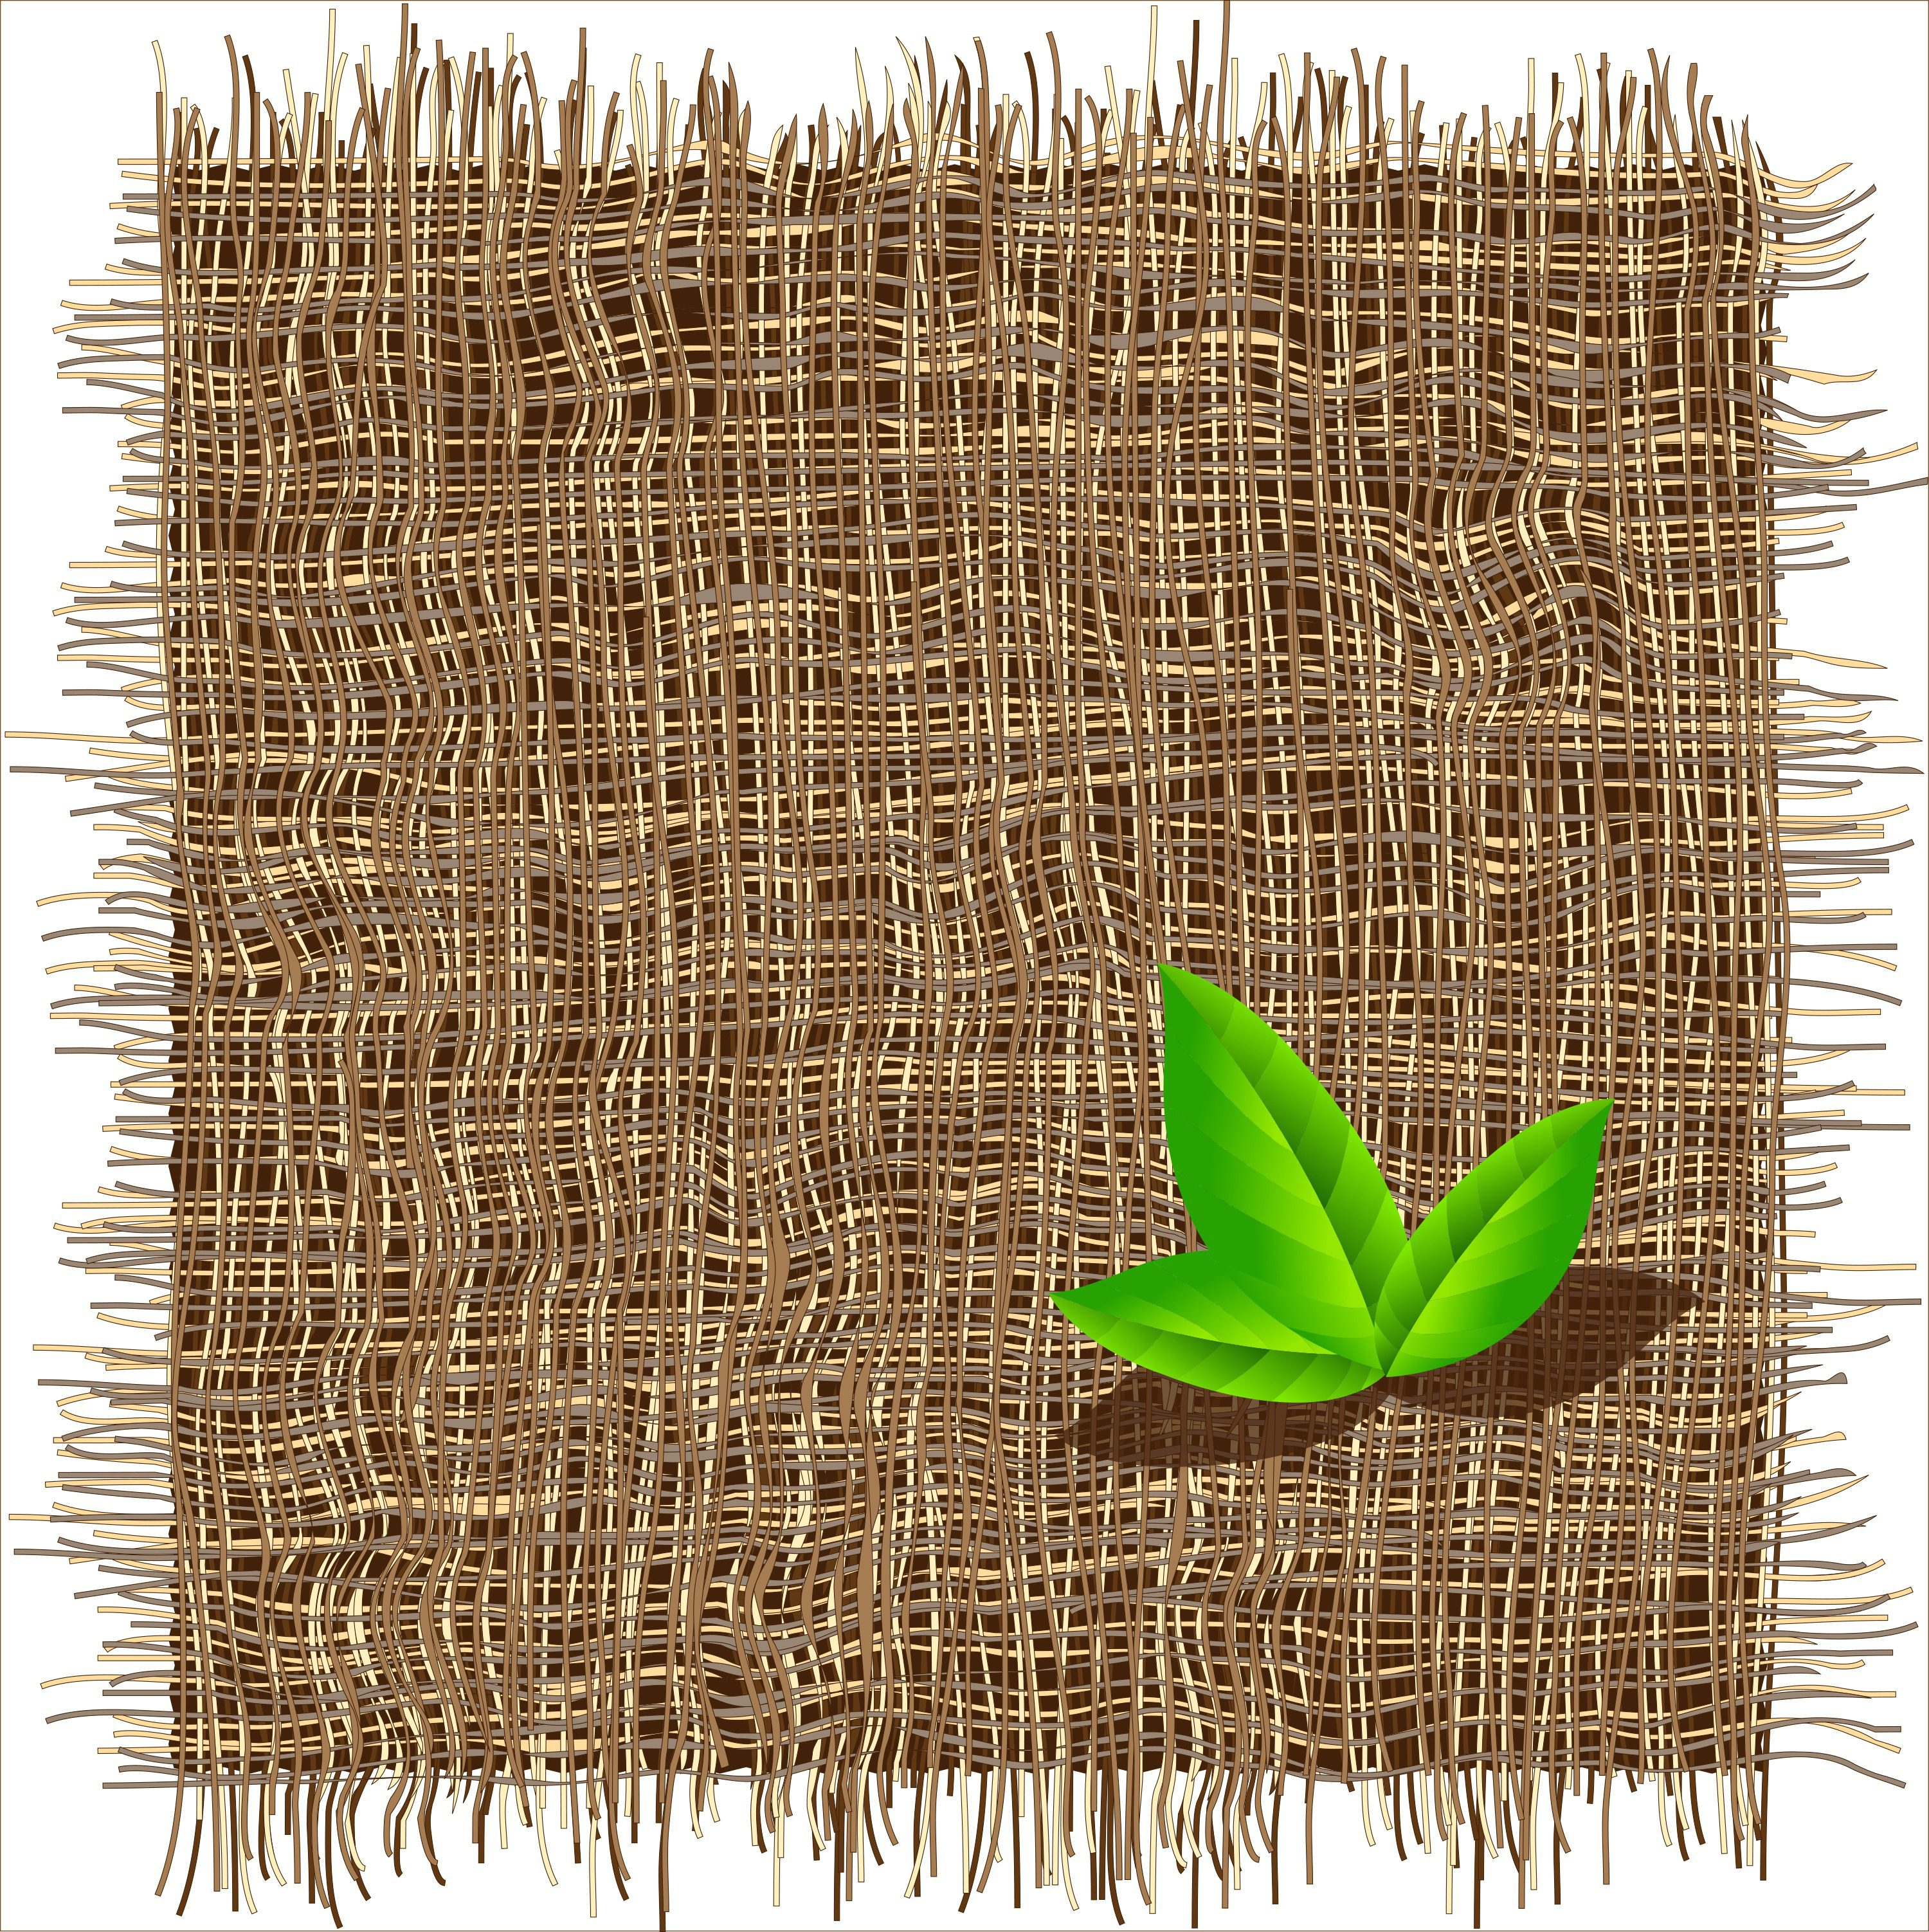 Eco-chato, bio-desagradável , Ambientalista